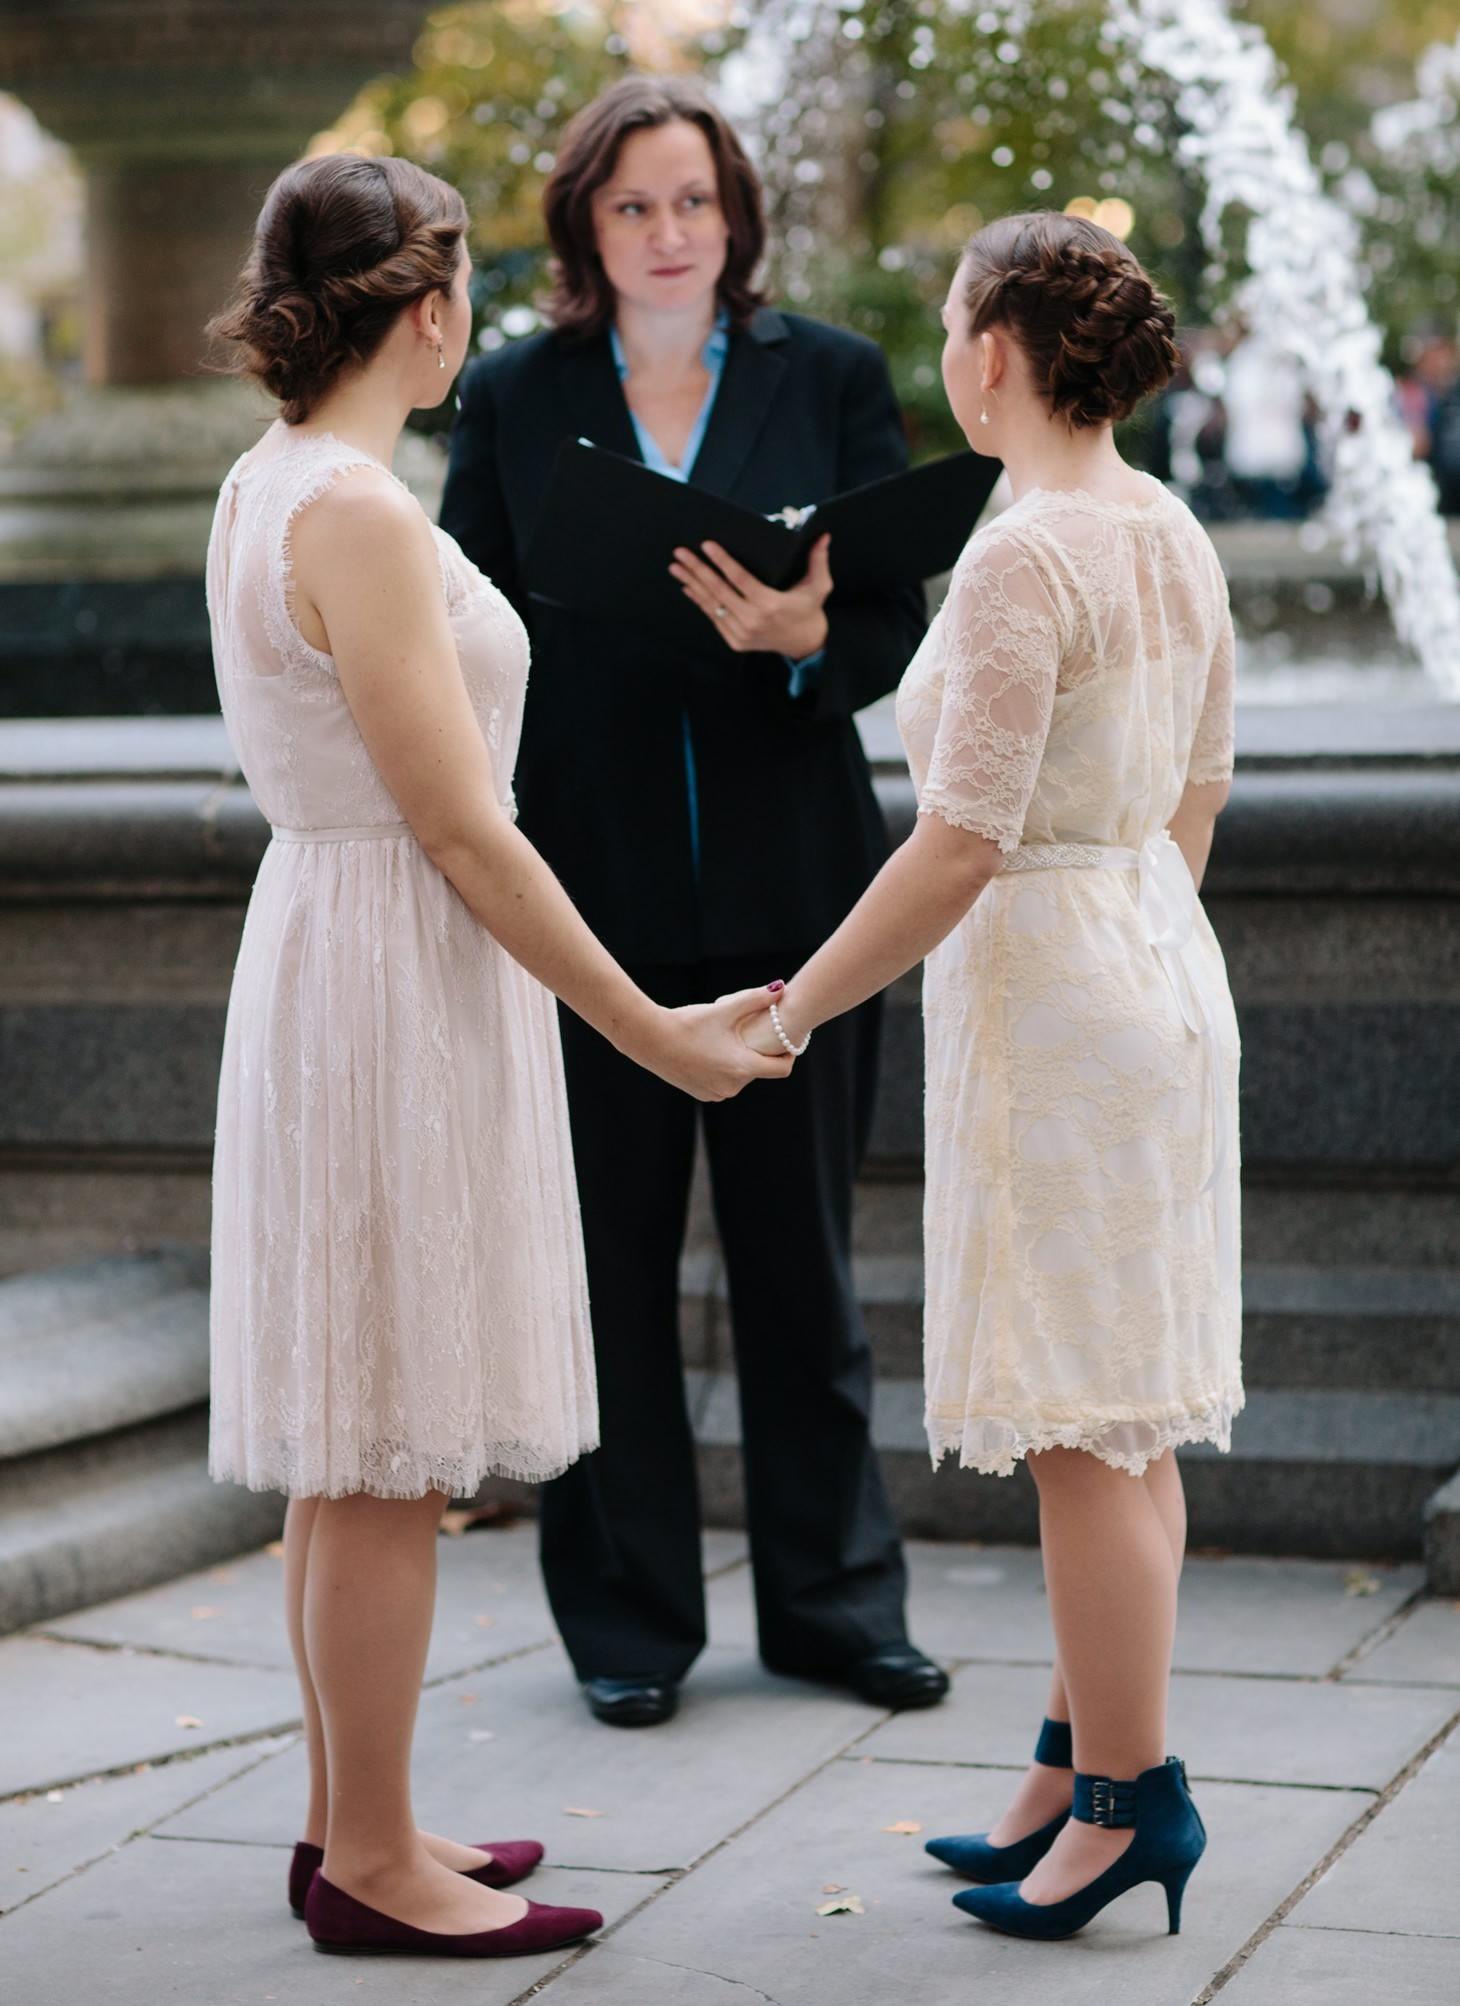 004-nyc-wedding-elopement-lgbt-friendly-photographer-city-hall-grand-central.jpg